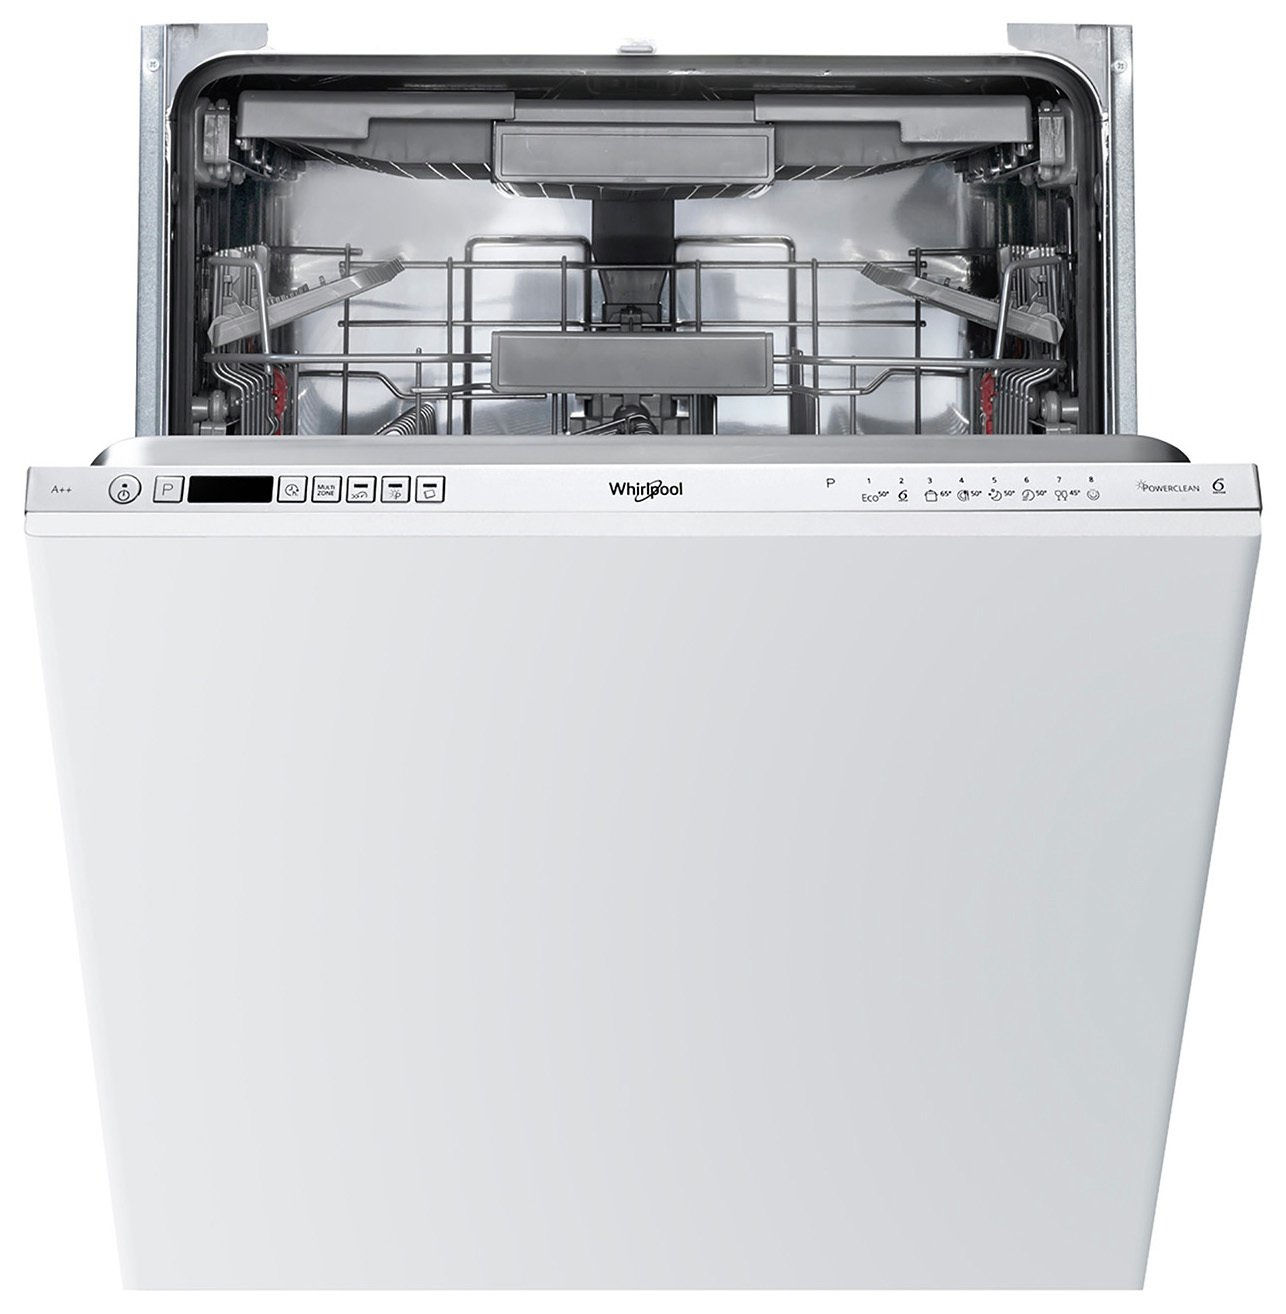 Whirlpool WIC3C23PEF Full Size Integrated Dishwasher - White